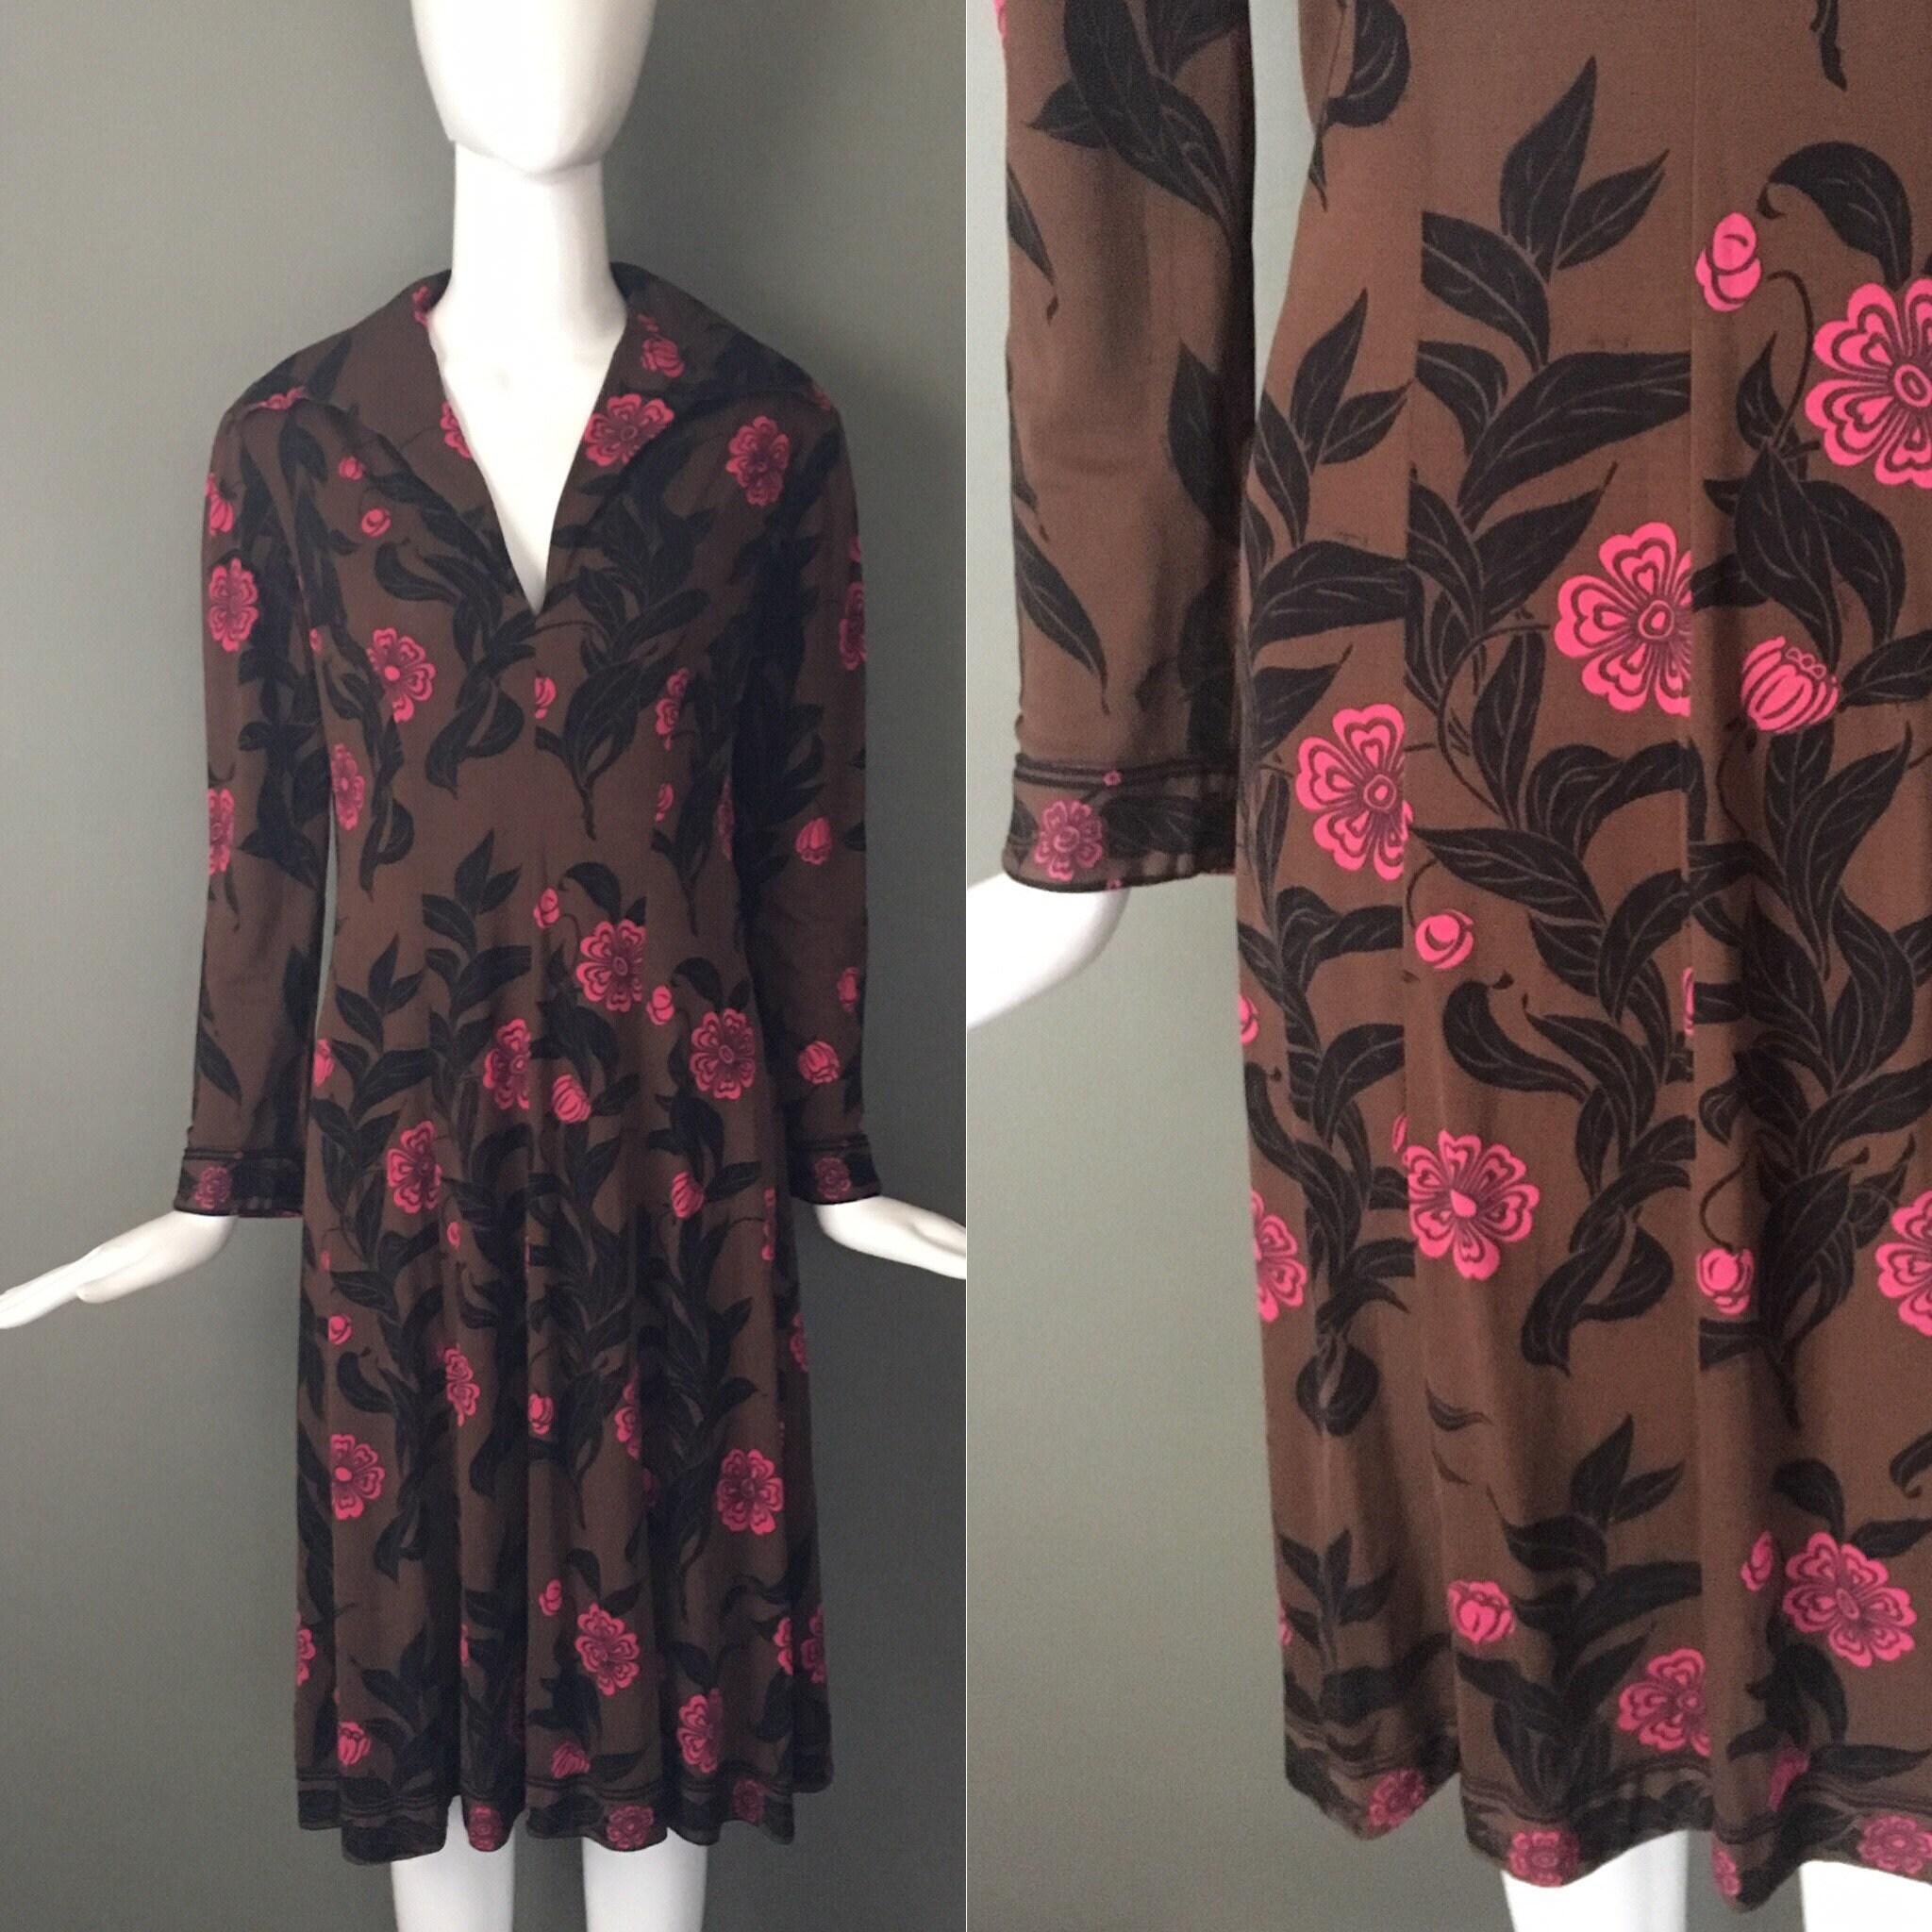 c3ba81e7ffdd Vtg 60s Emilio Pucci Mod Hot Pink Print Silk Jersey Dress Metal Side ...